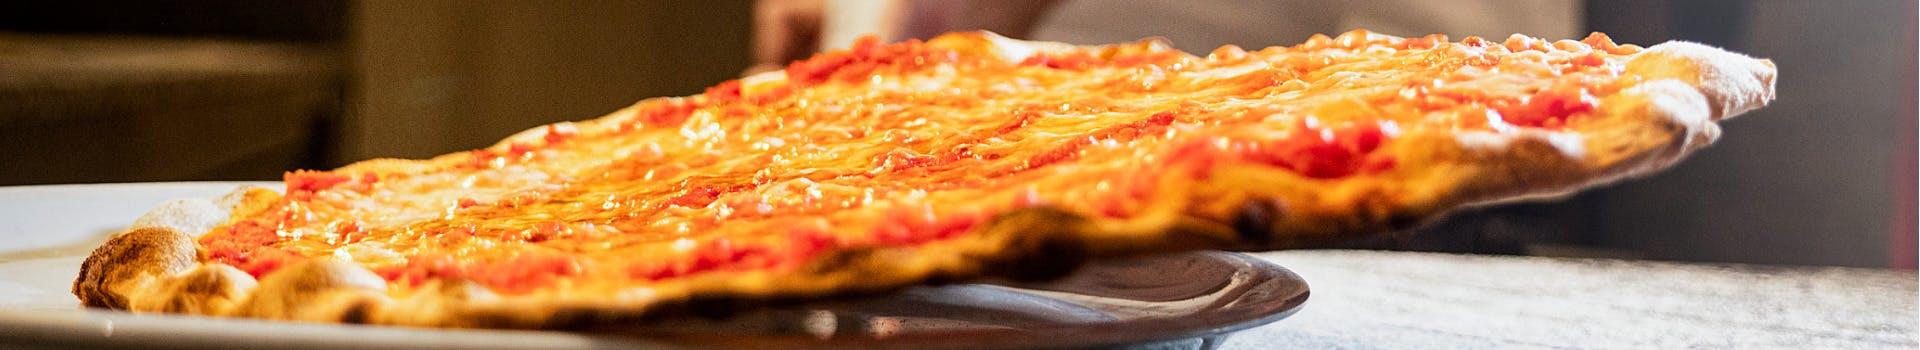 Pizza Grani Antichi - Eataly